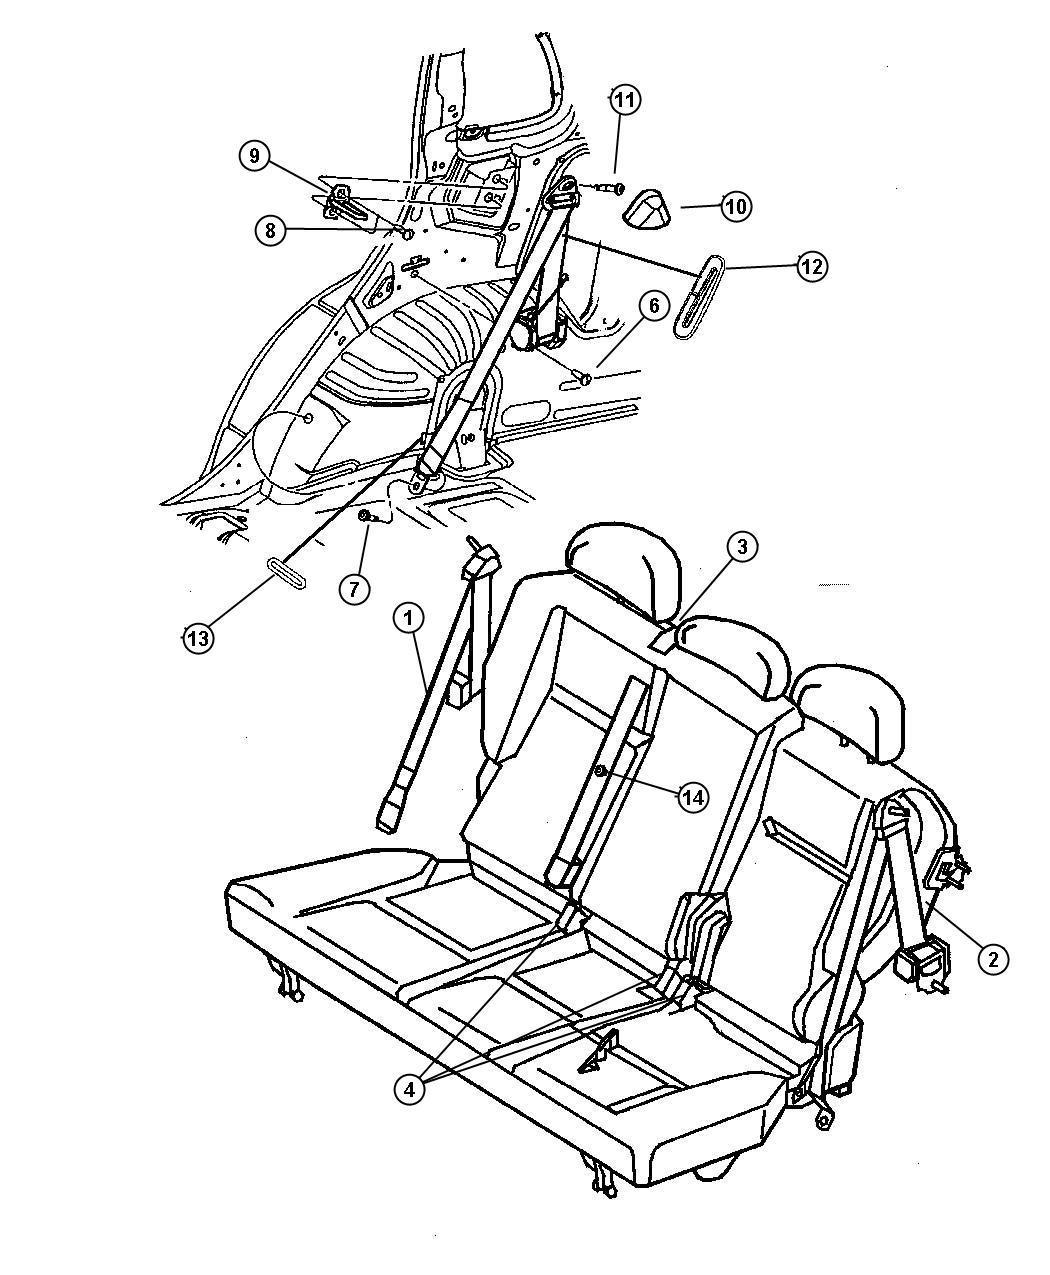 2001 Dodge Ram 1500 Seat belt. Buckle half w/latch